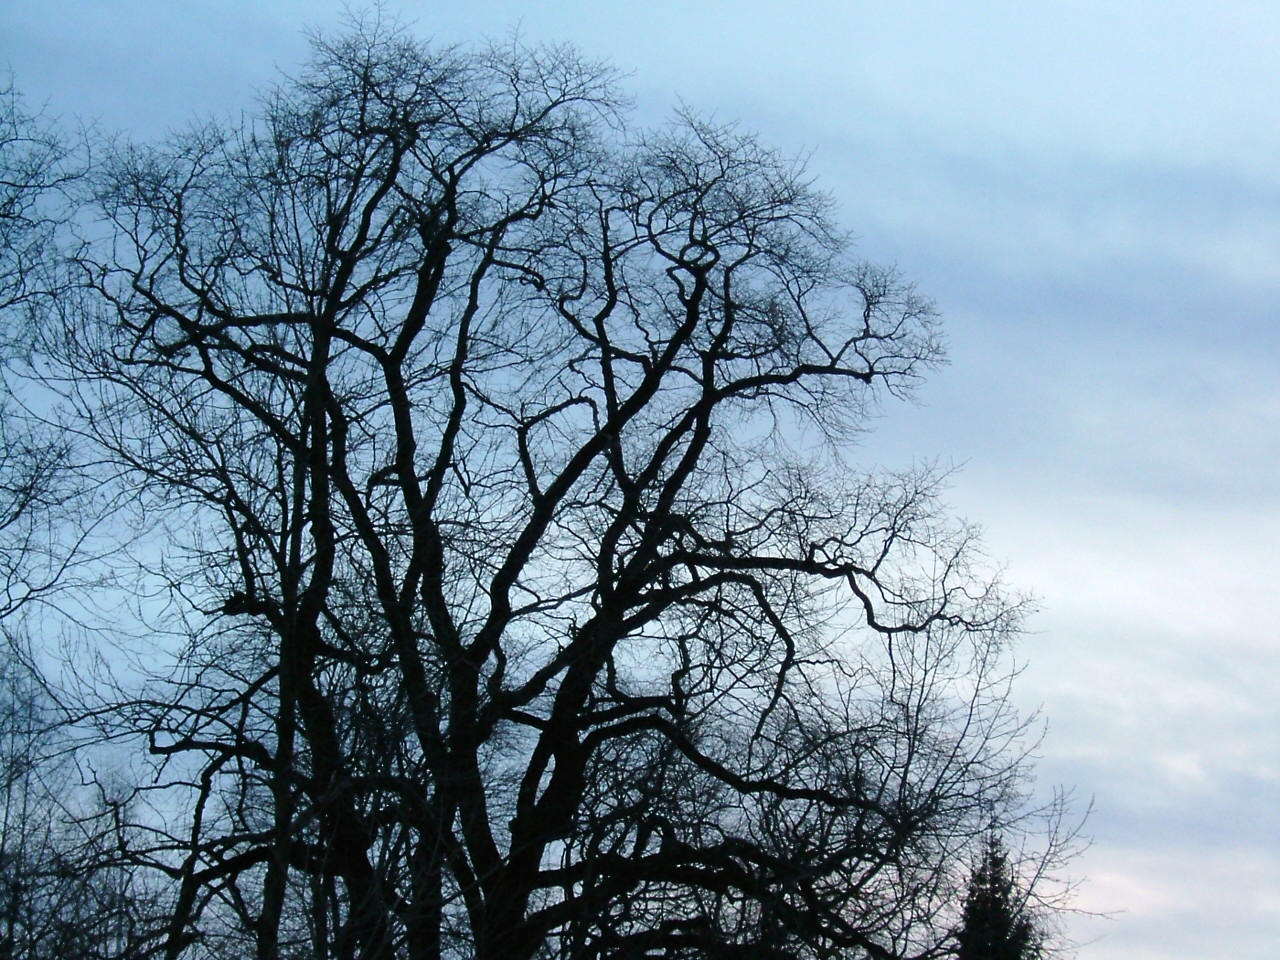 A tree. by knirket